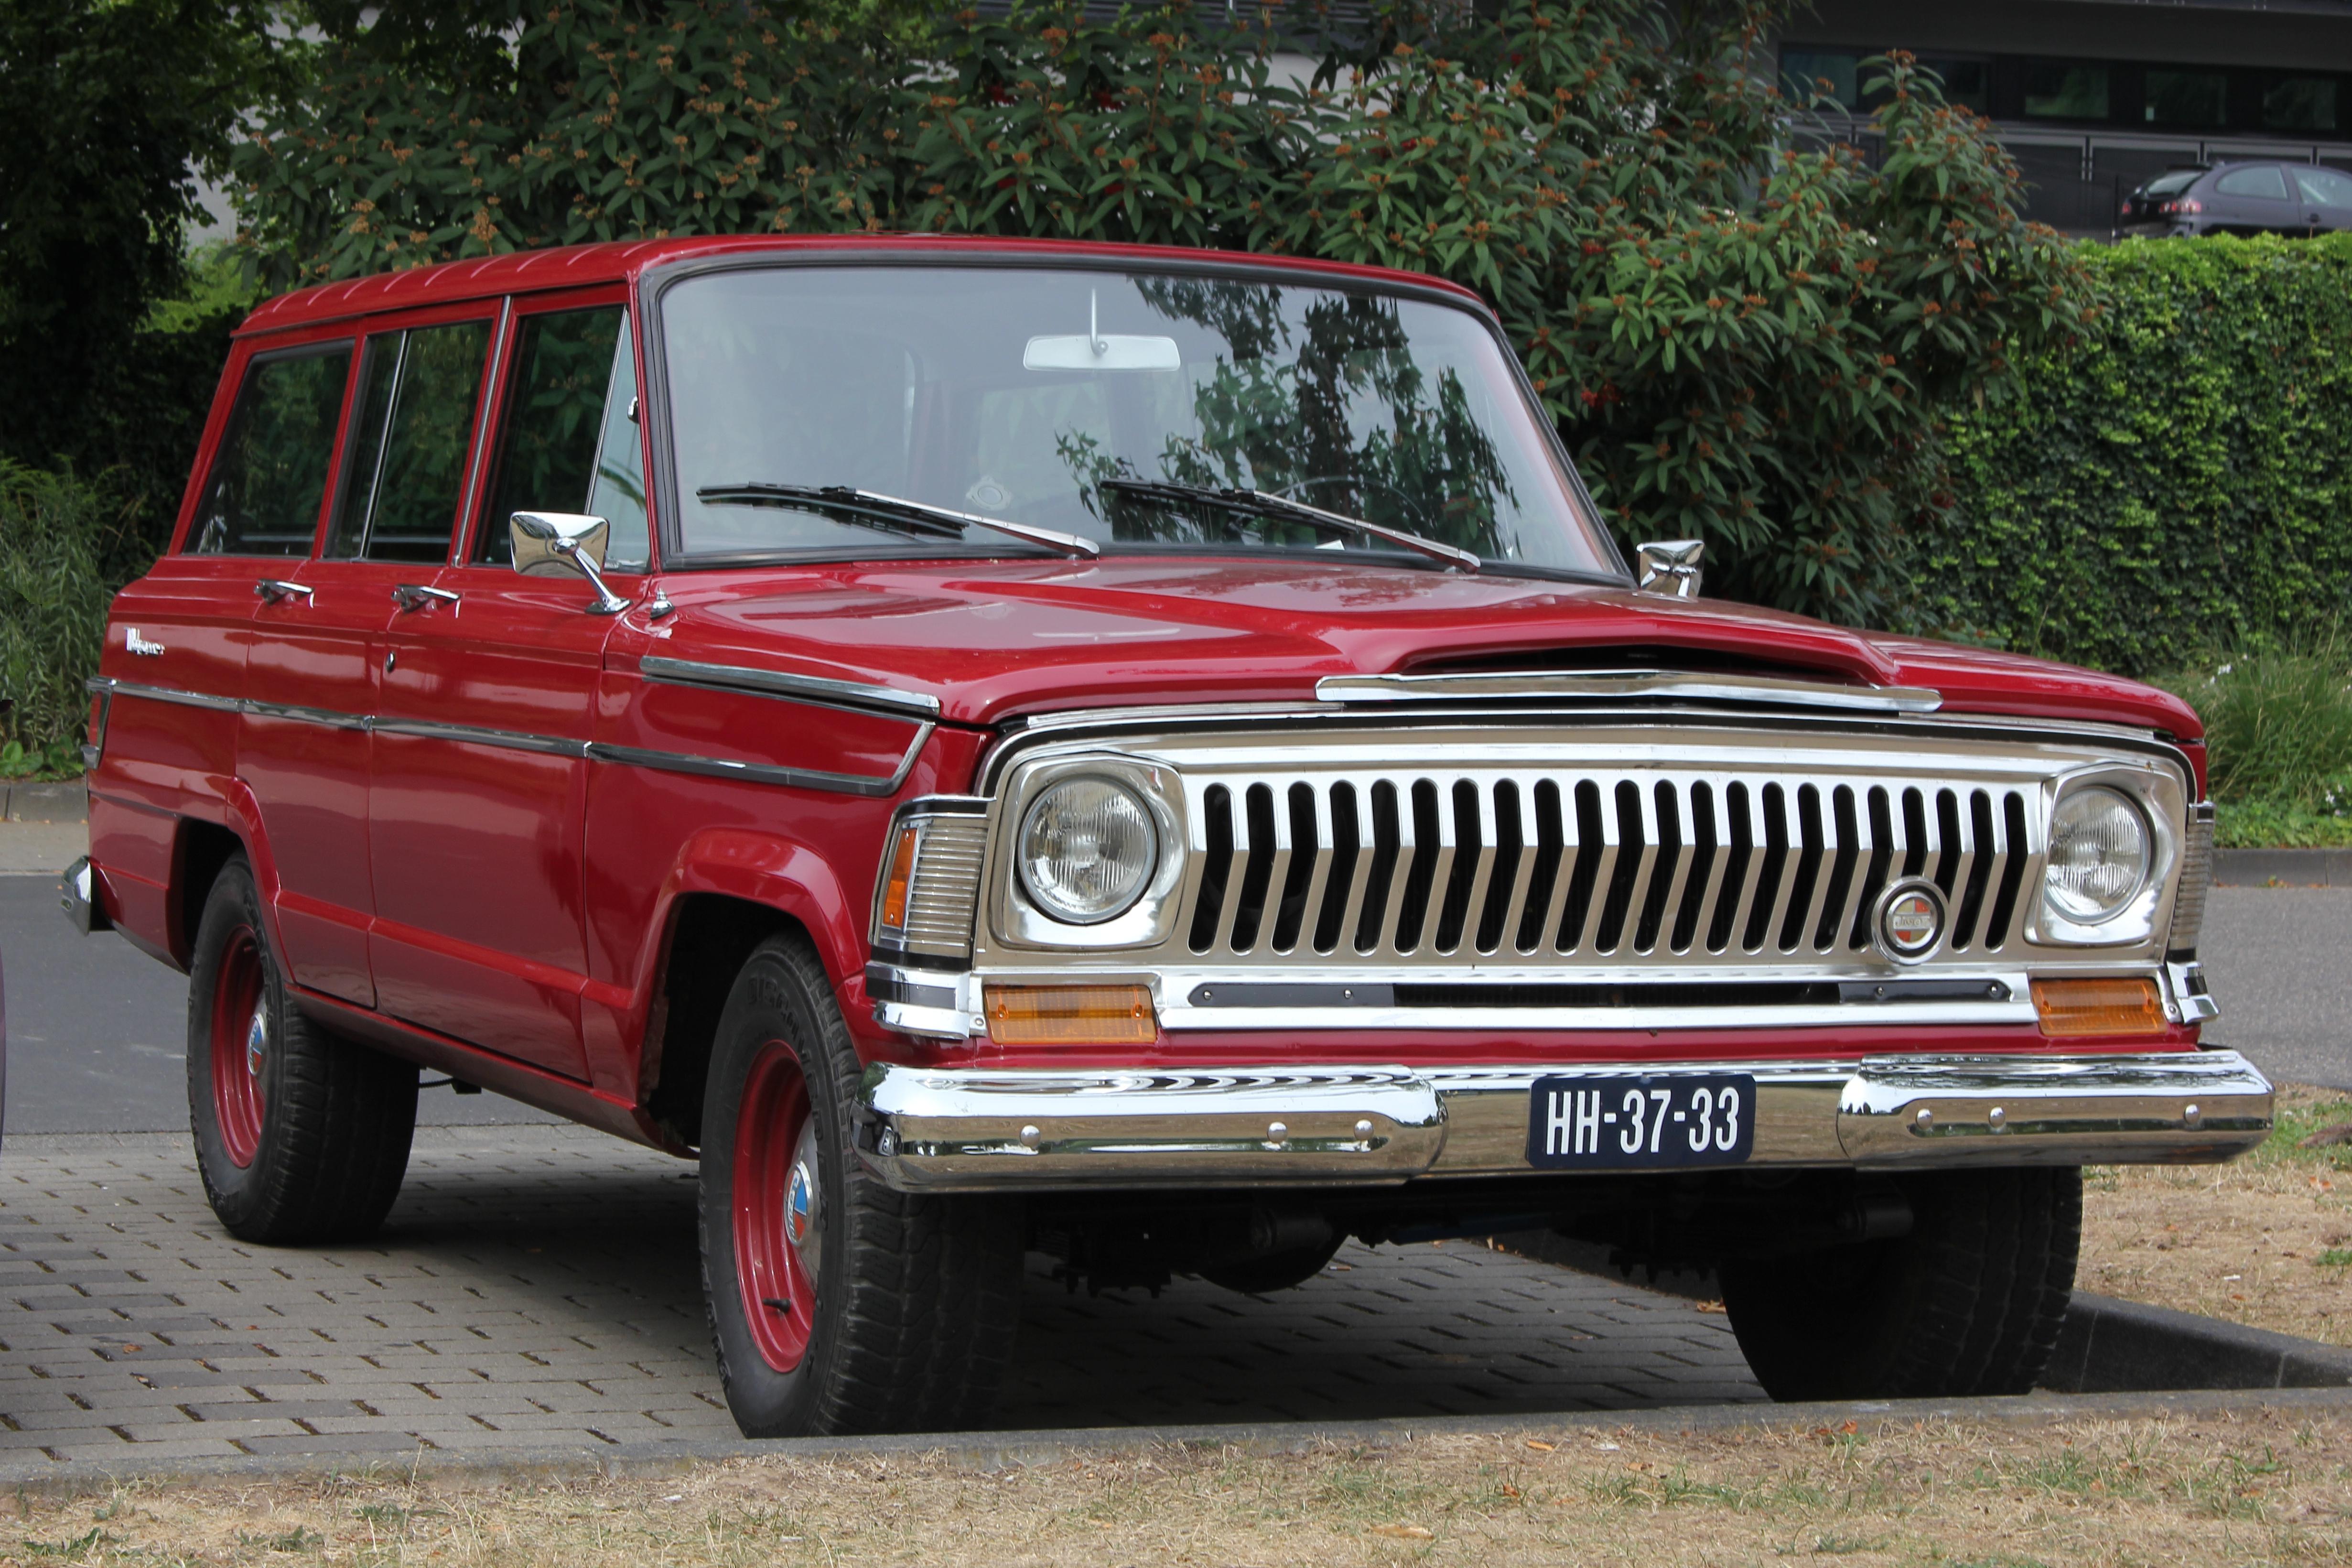 https://upload.wikimedia.org/wikipedia/commons/6/68/Jeep_Wagoneer,_Bj._ca._1968_(2015-08-12_b).JPG